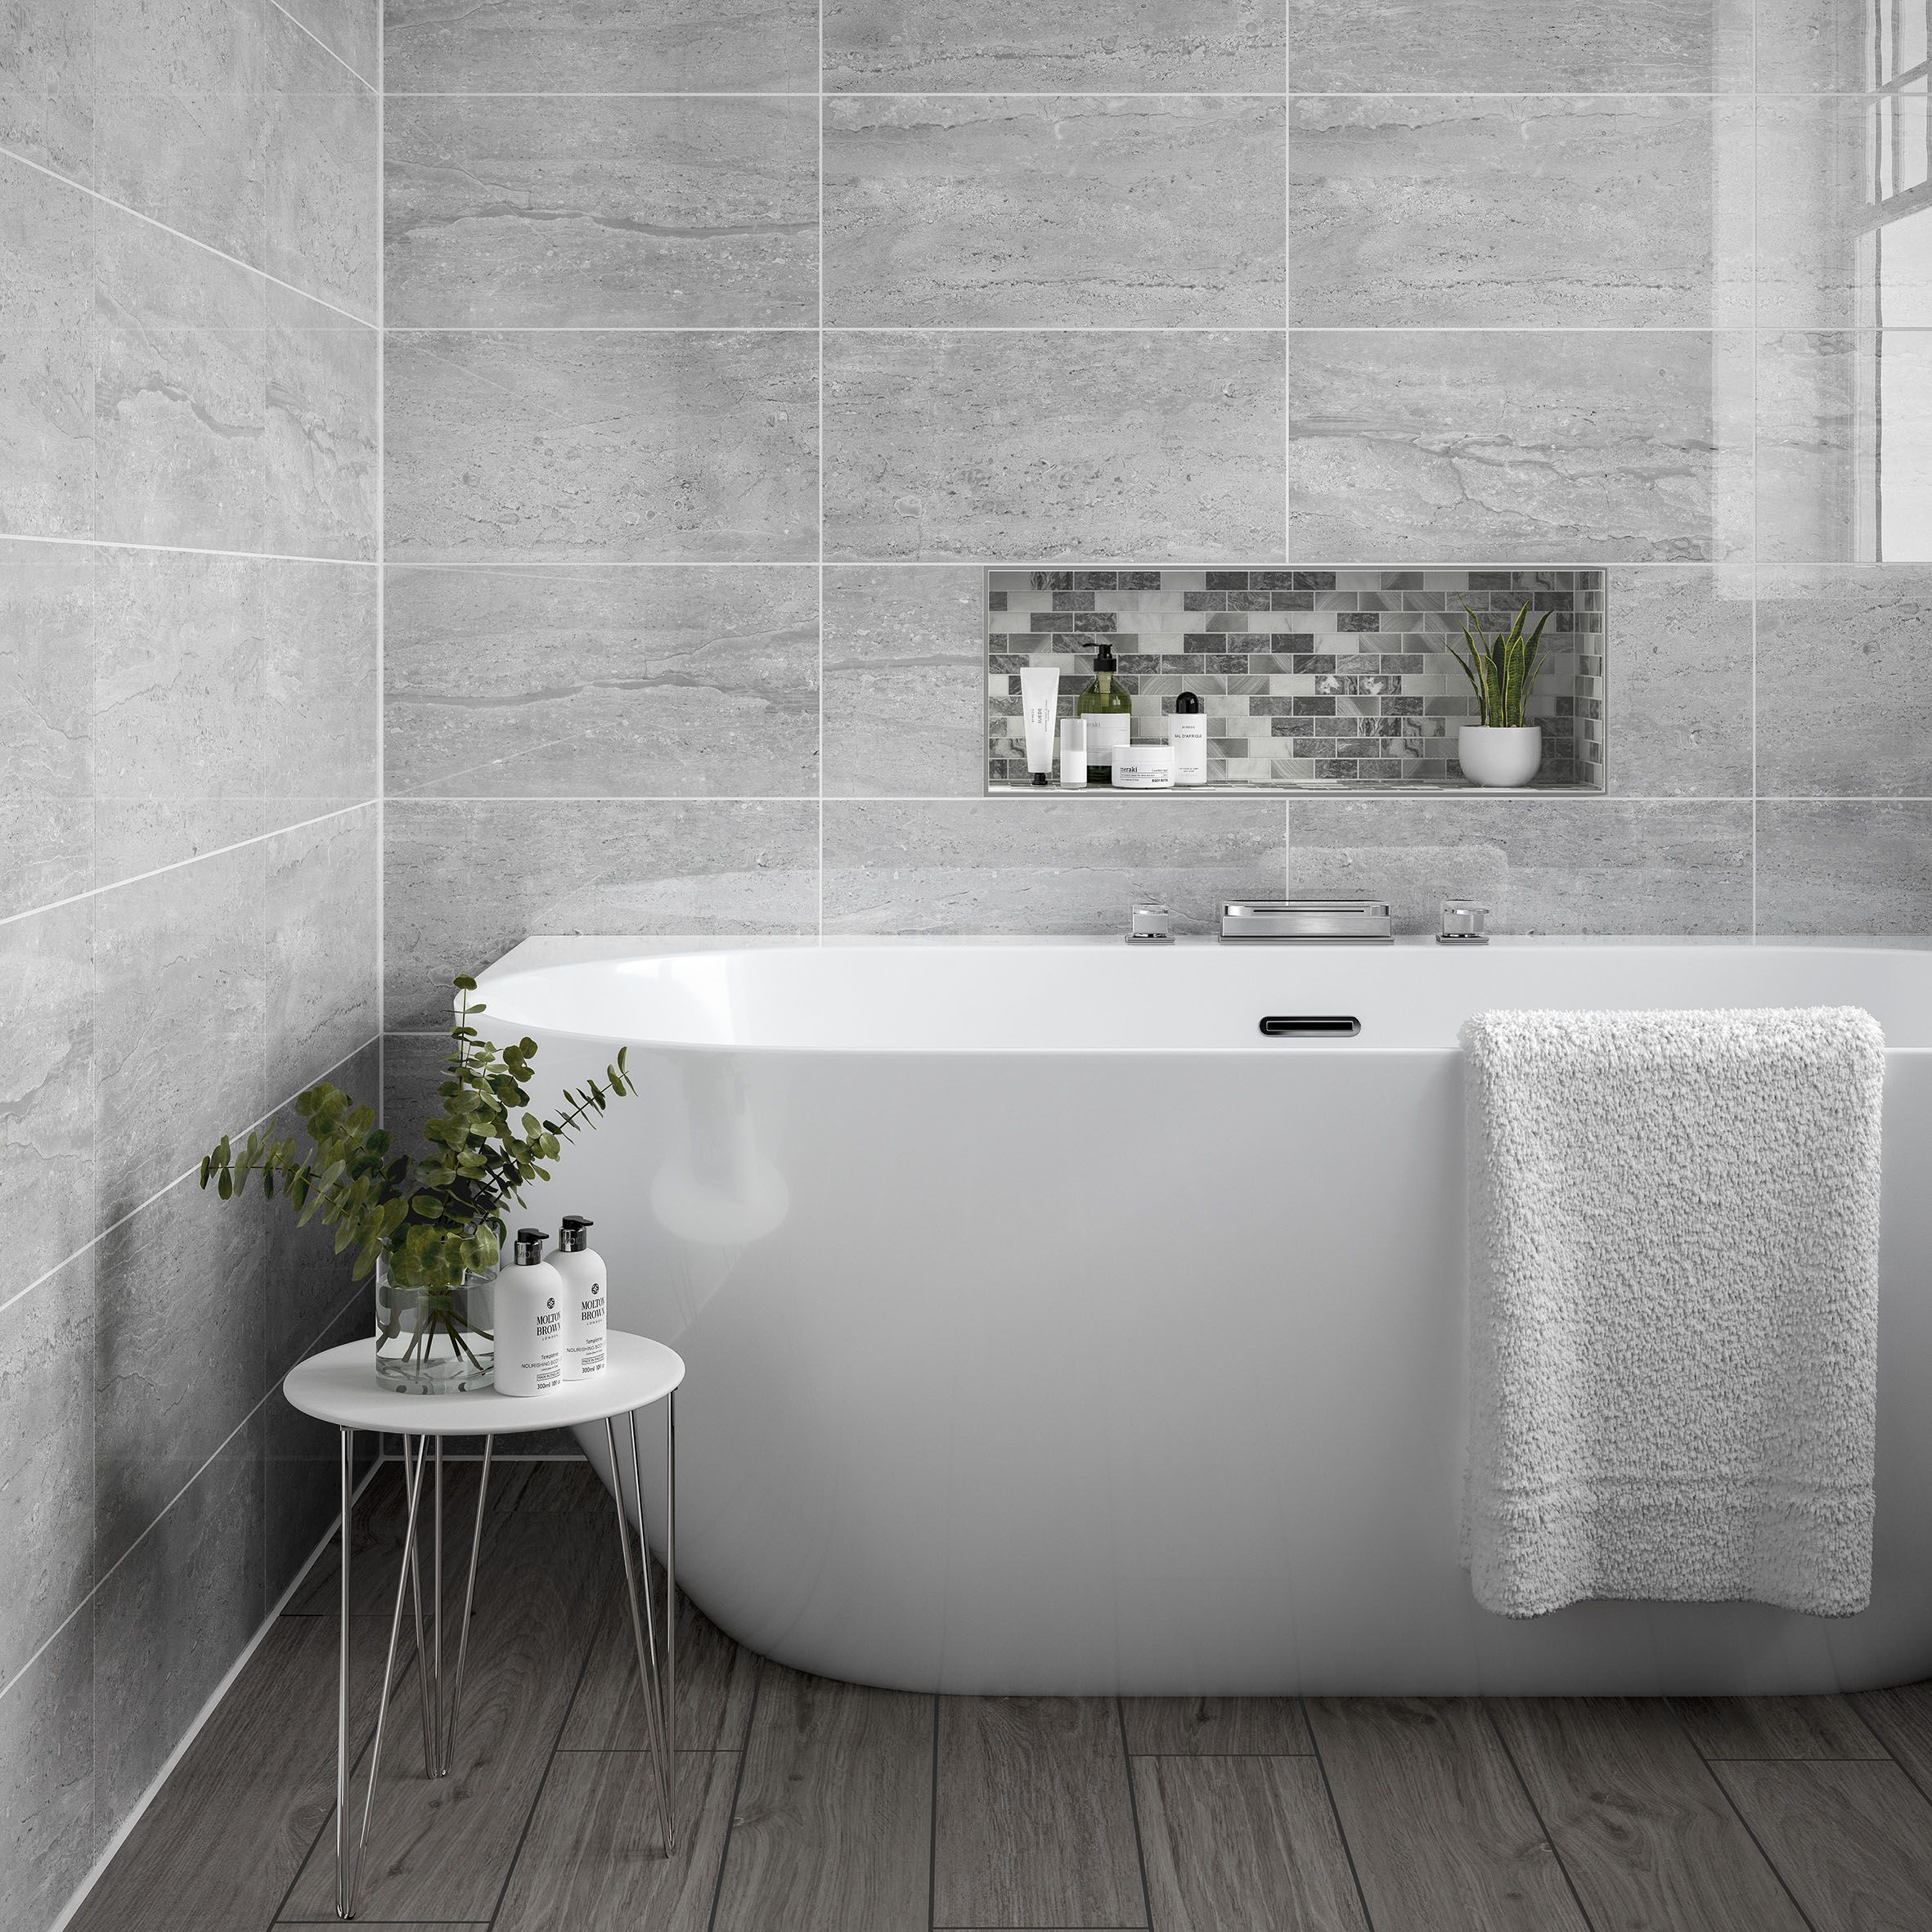 Pallington Light Grey Gloss 250x500mm Ceramic Wall Tile In 2020 Grey Bathroom Wall Tiles Grey Bathroom Tiles Light Grey Bathrooms